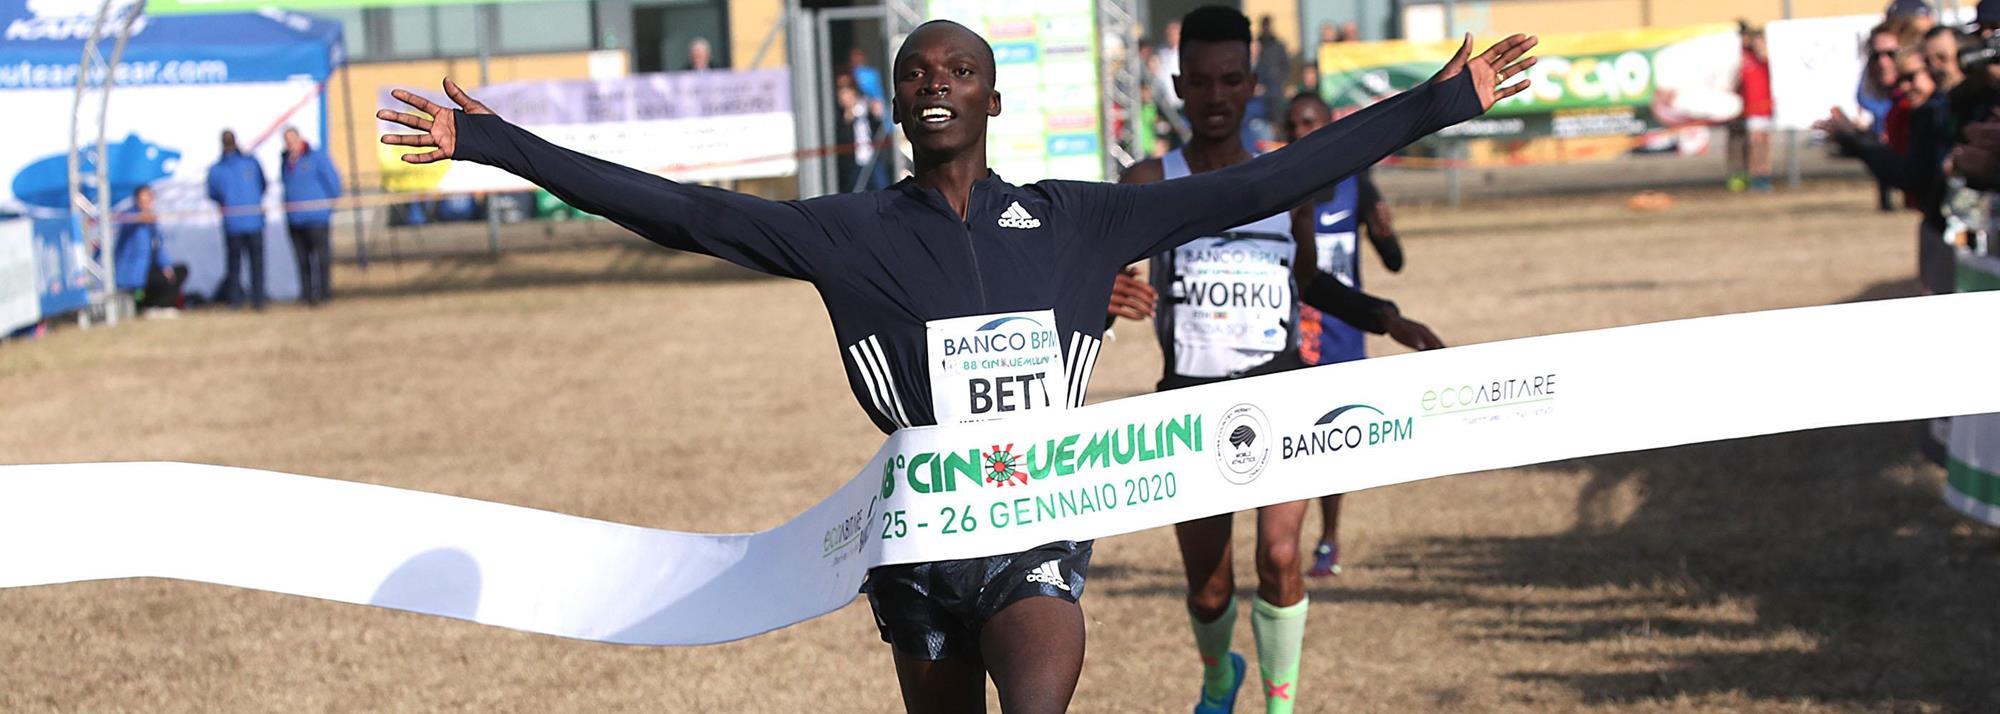 Bett and Yavi claim Cinque Mulini victories